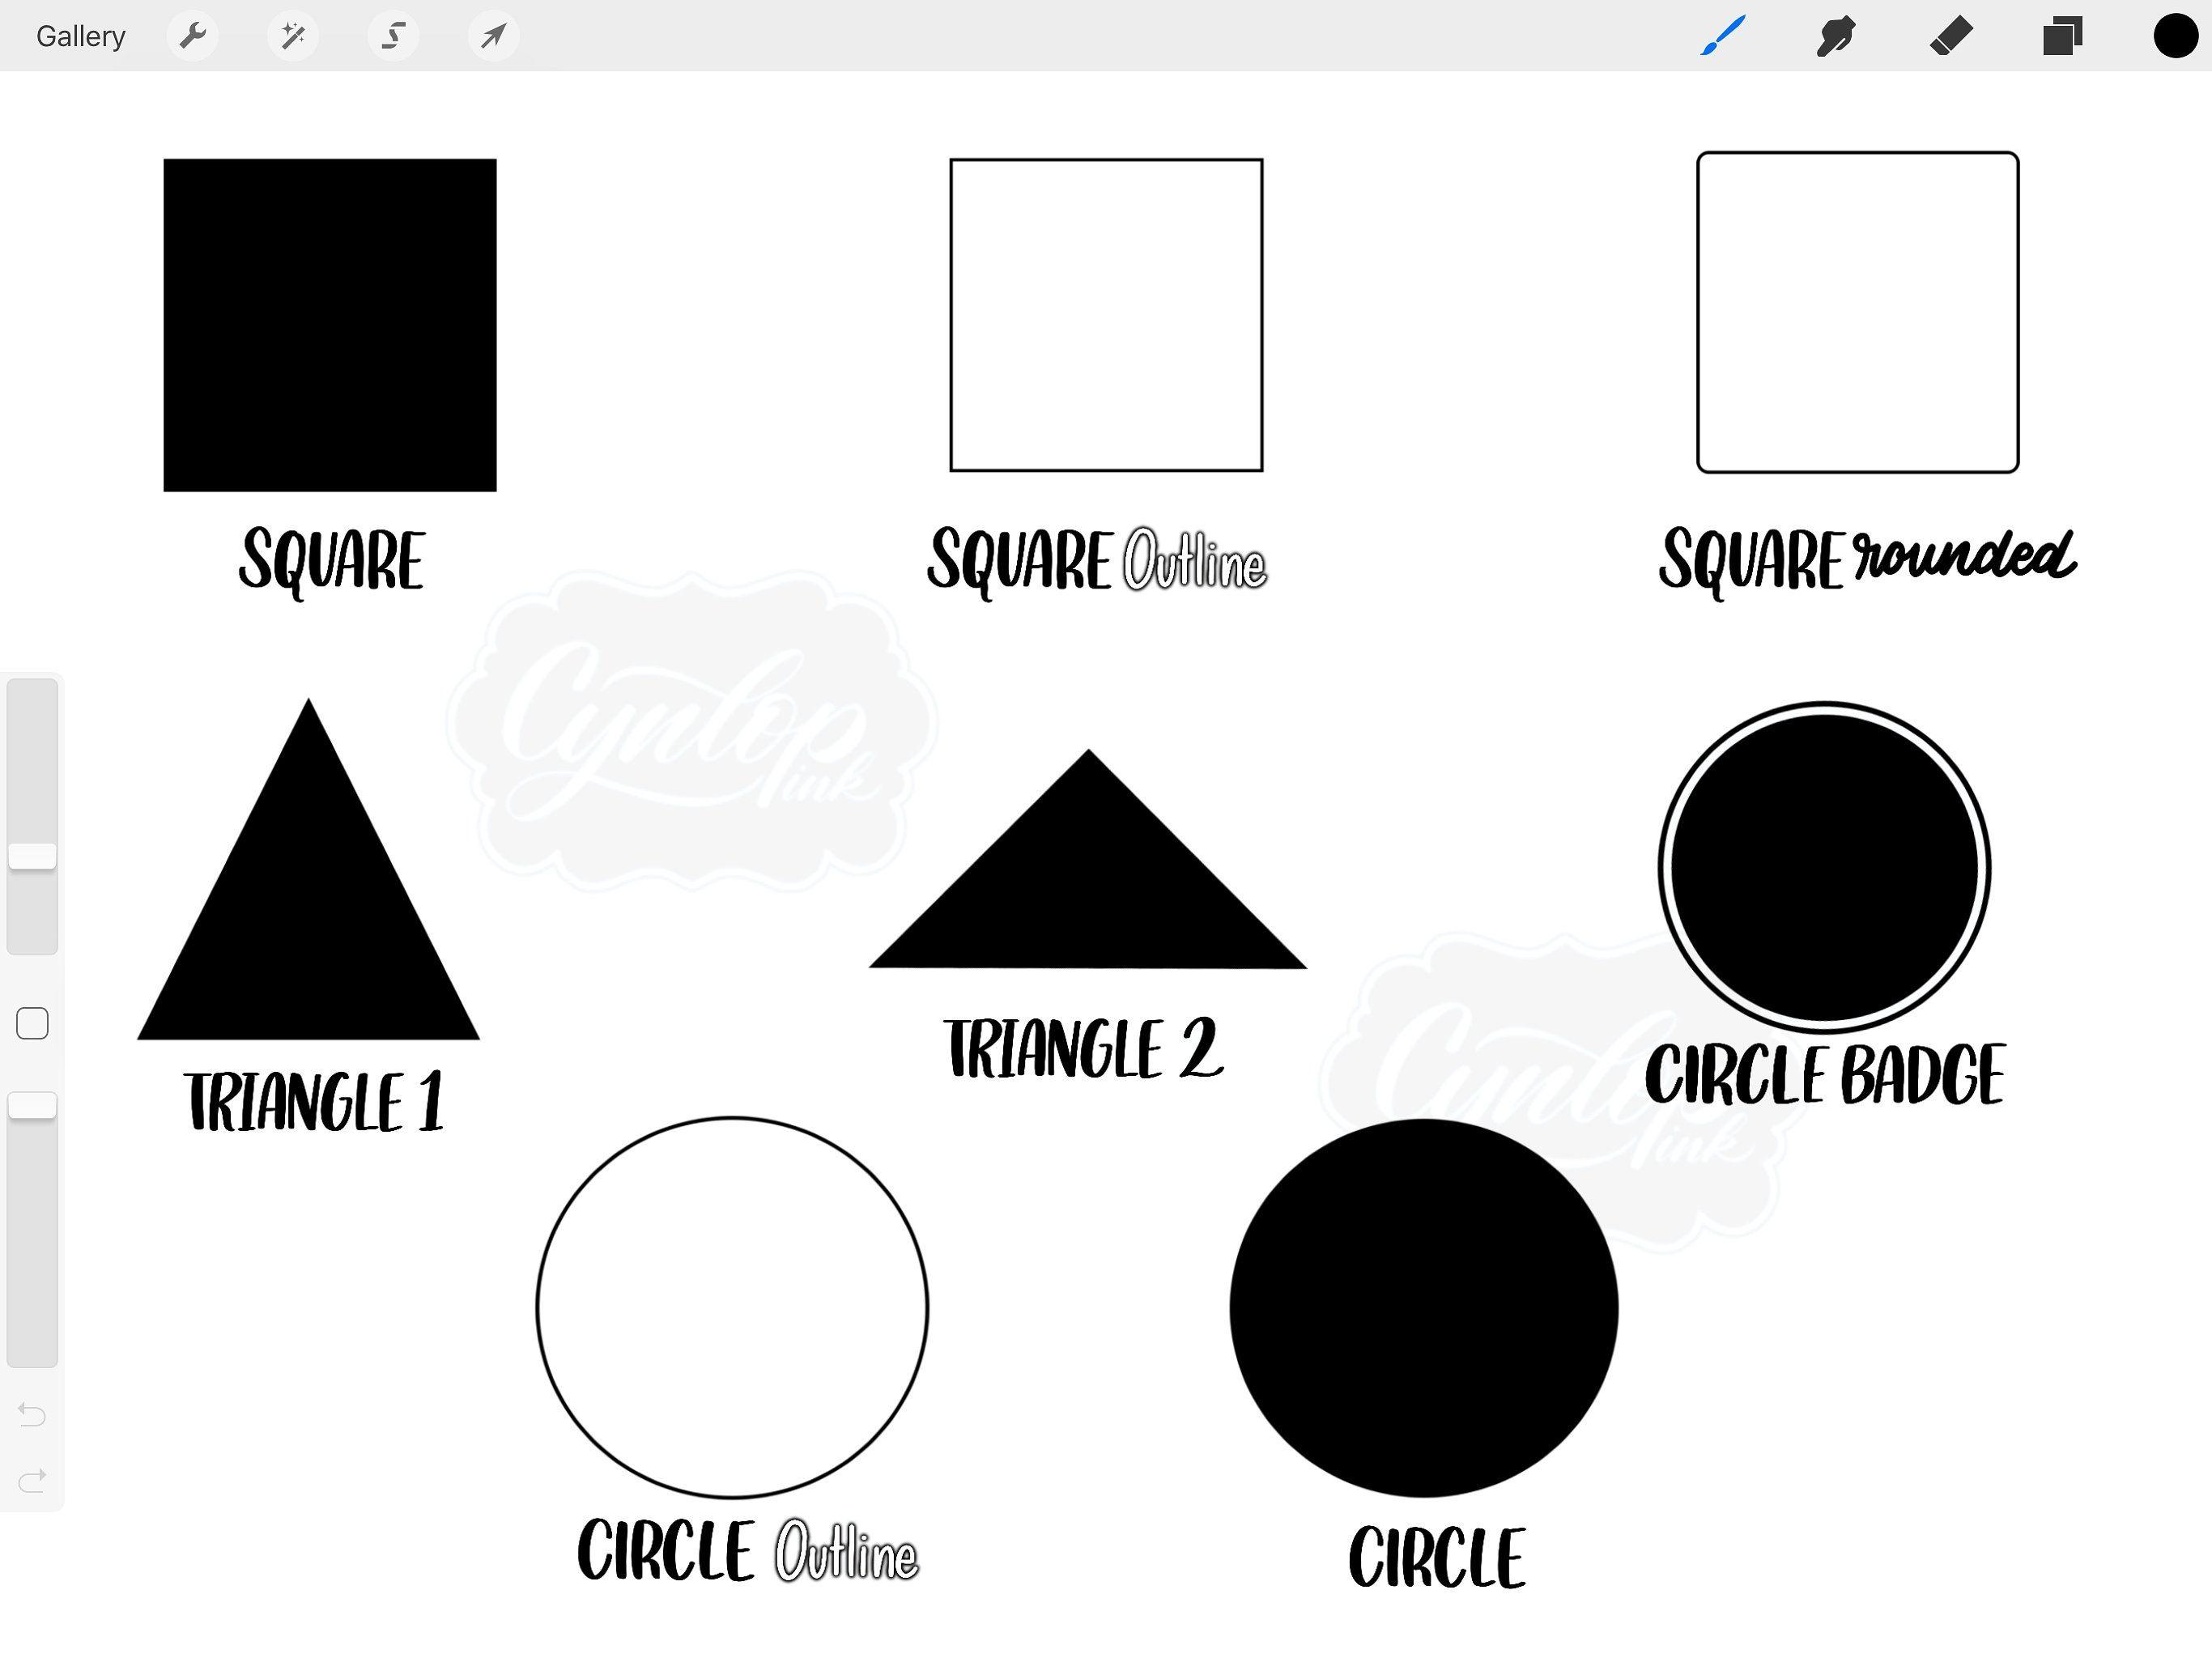 Procreate Brush Stamp Shapes Pattern app, Circle outline